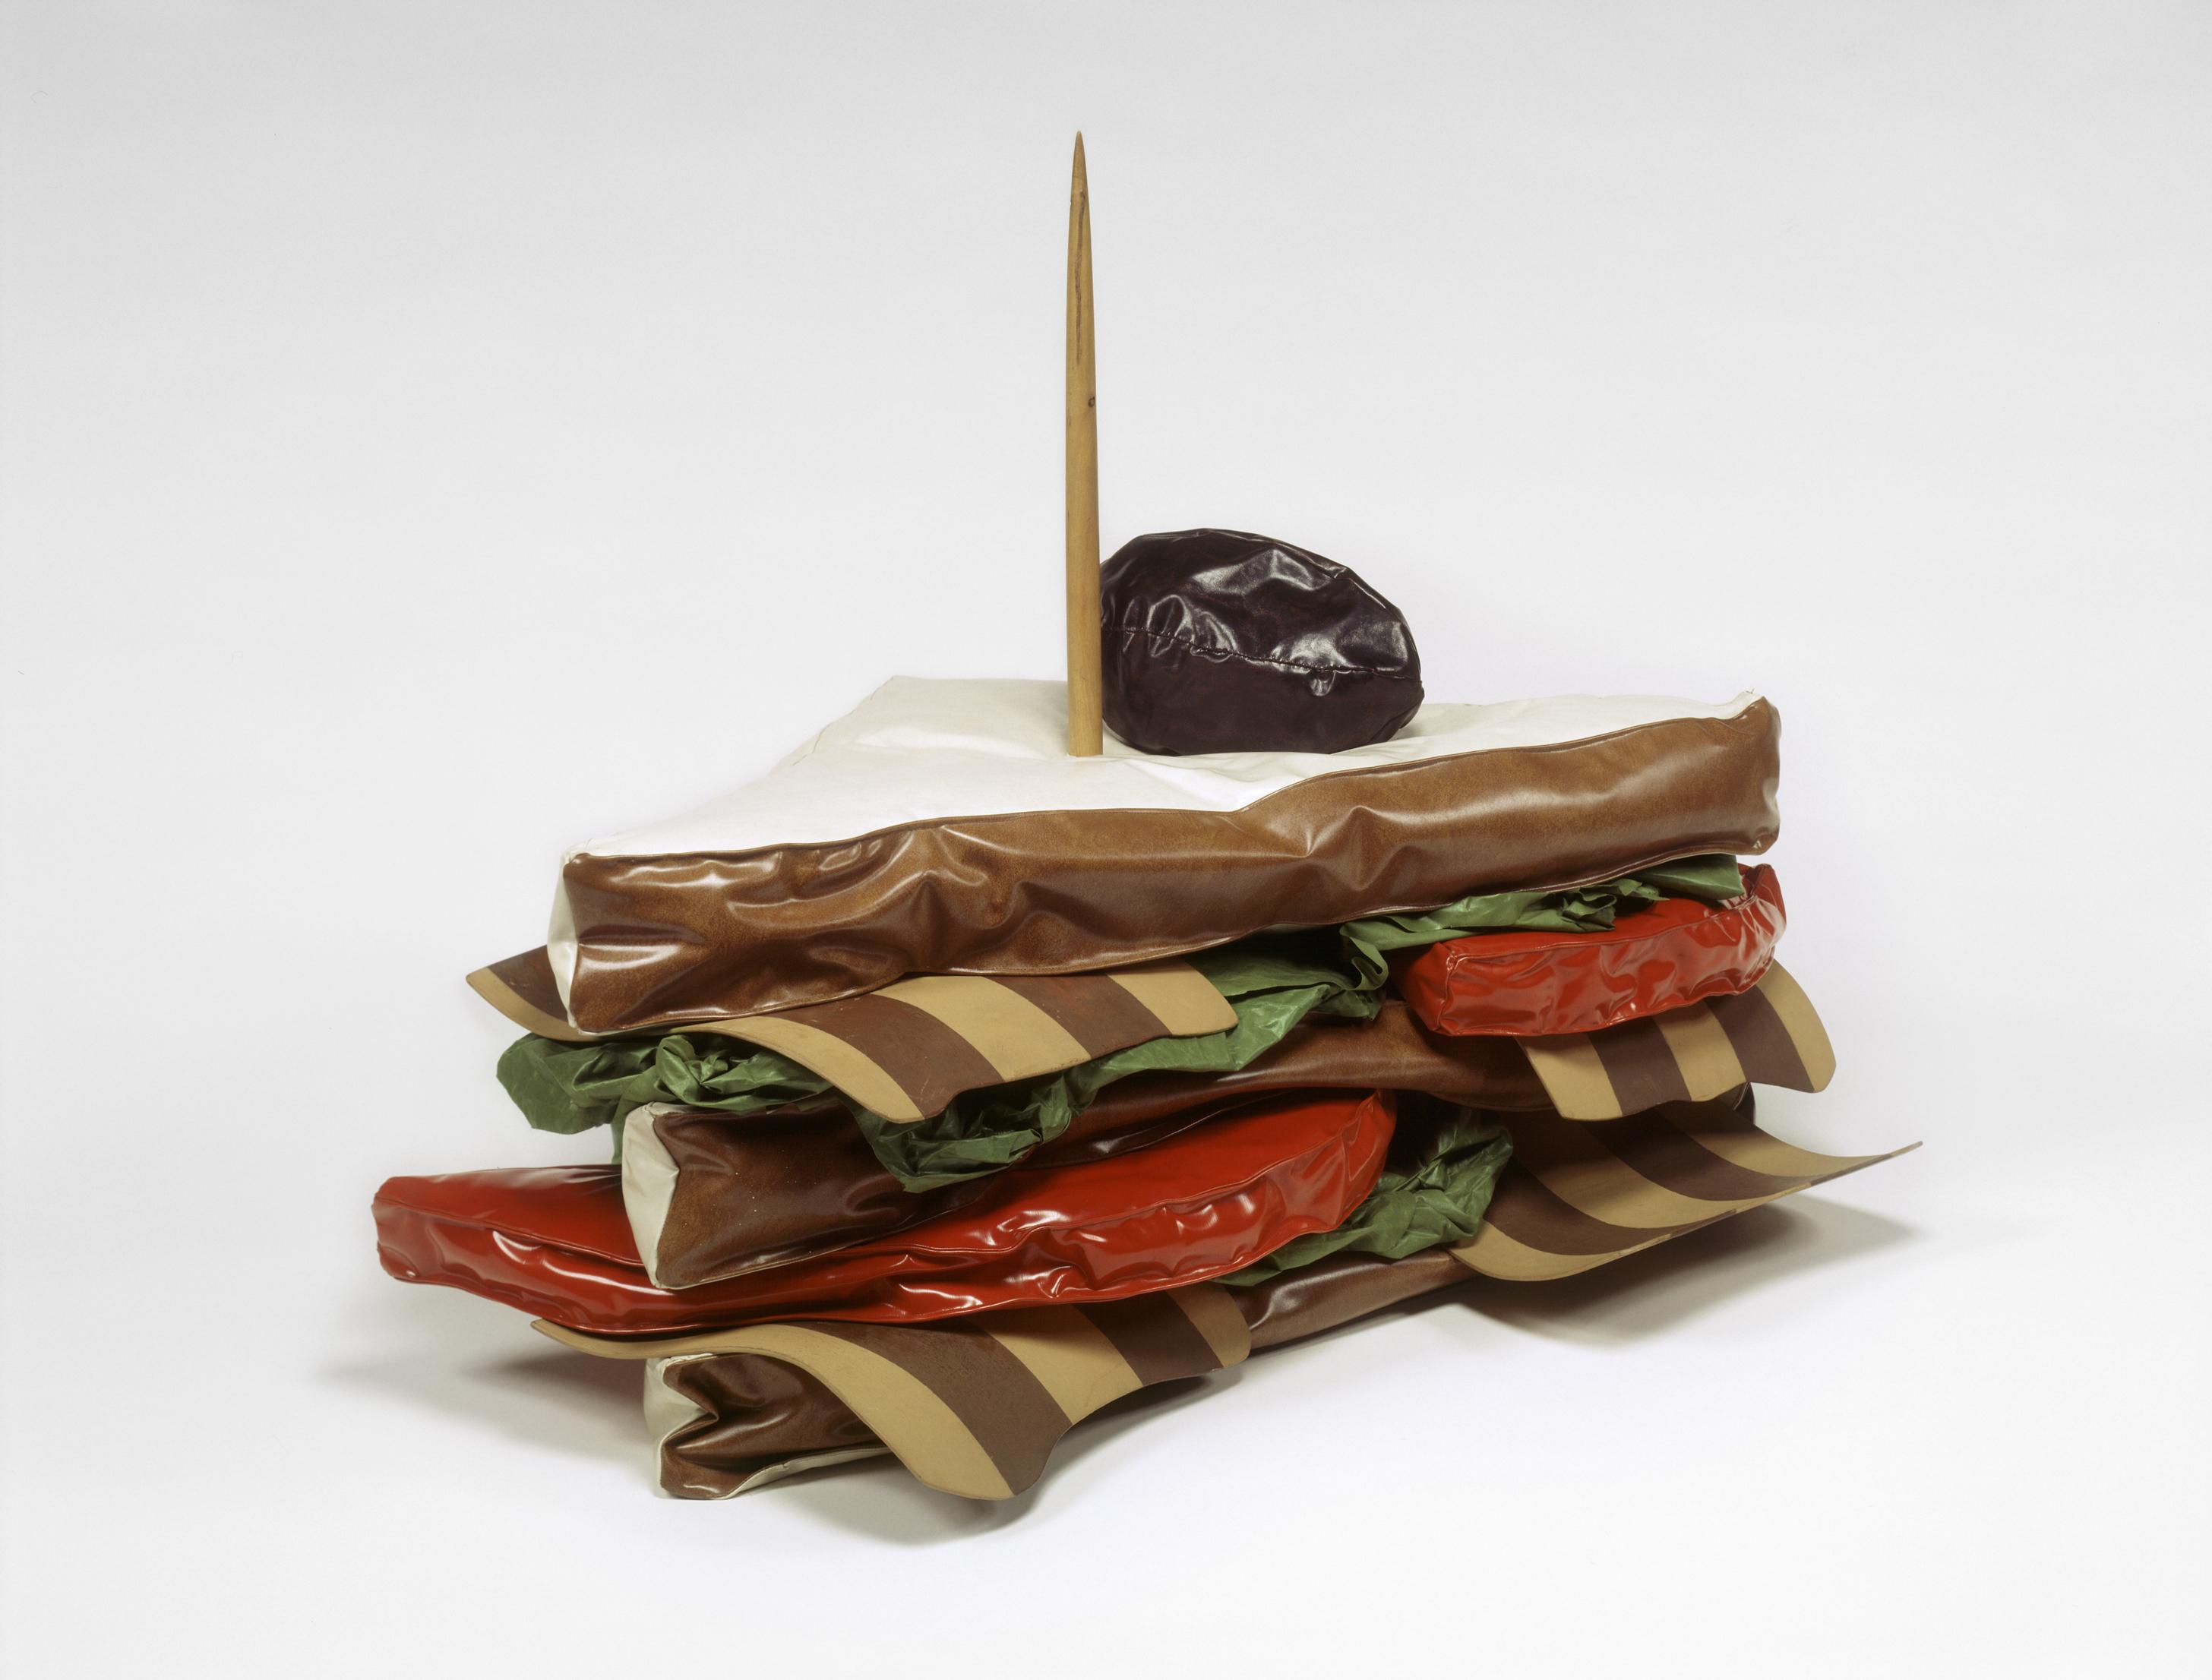 New York Claes Oldenburg At The Museum Of Modern Art Through